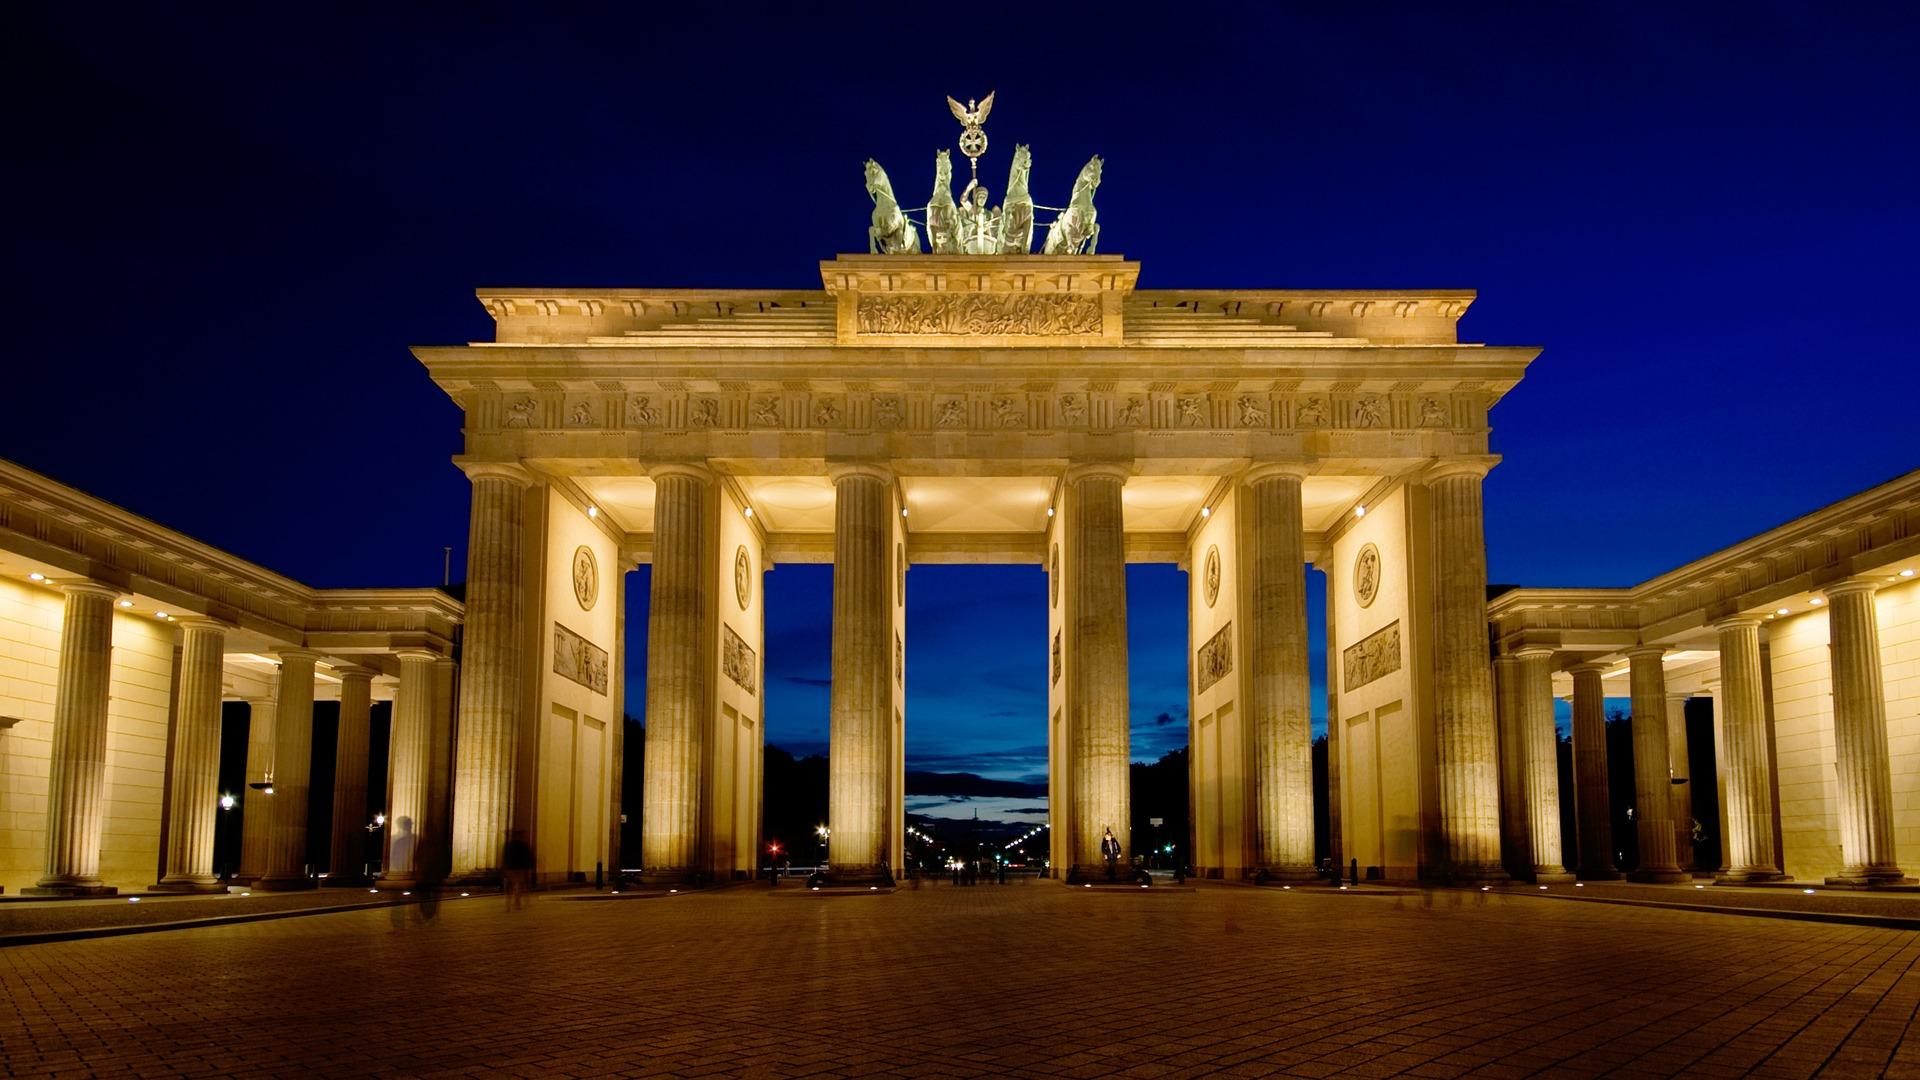 Brandenburg Gate Wallpaper Germany World Wallpapers in jpg format 1920x1080